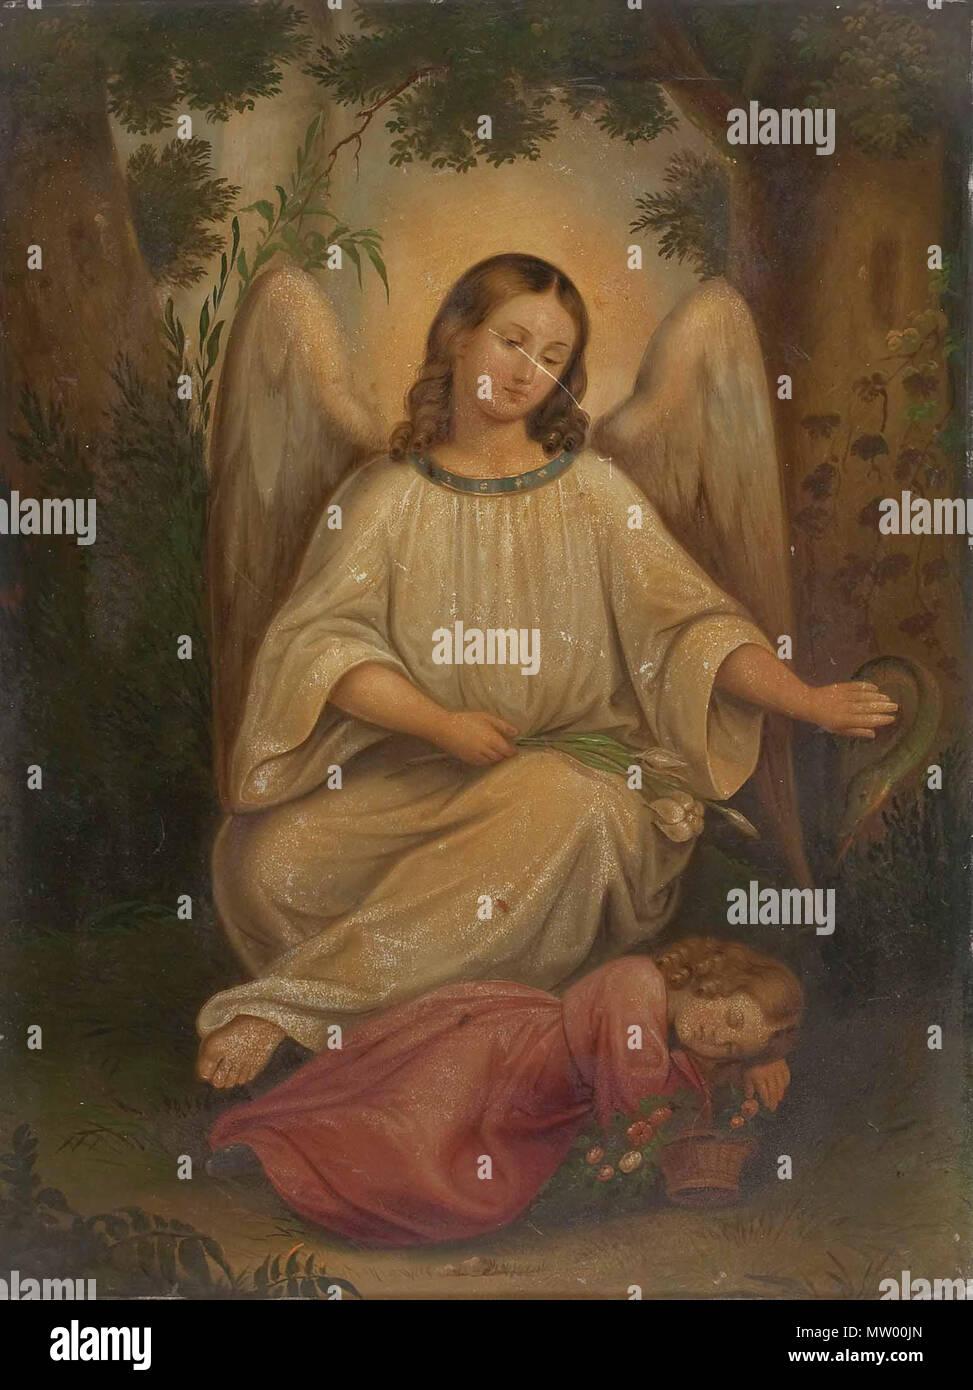 . Guardian Angel . Siglo xix. 547 Anónimo Schutzengel 19JH Imagen De Stock